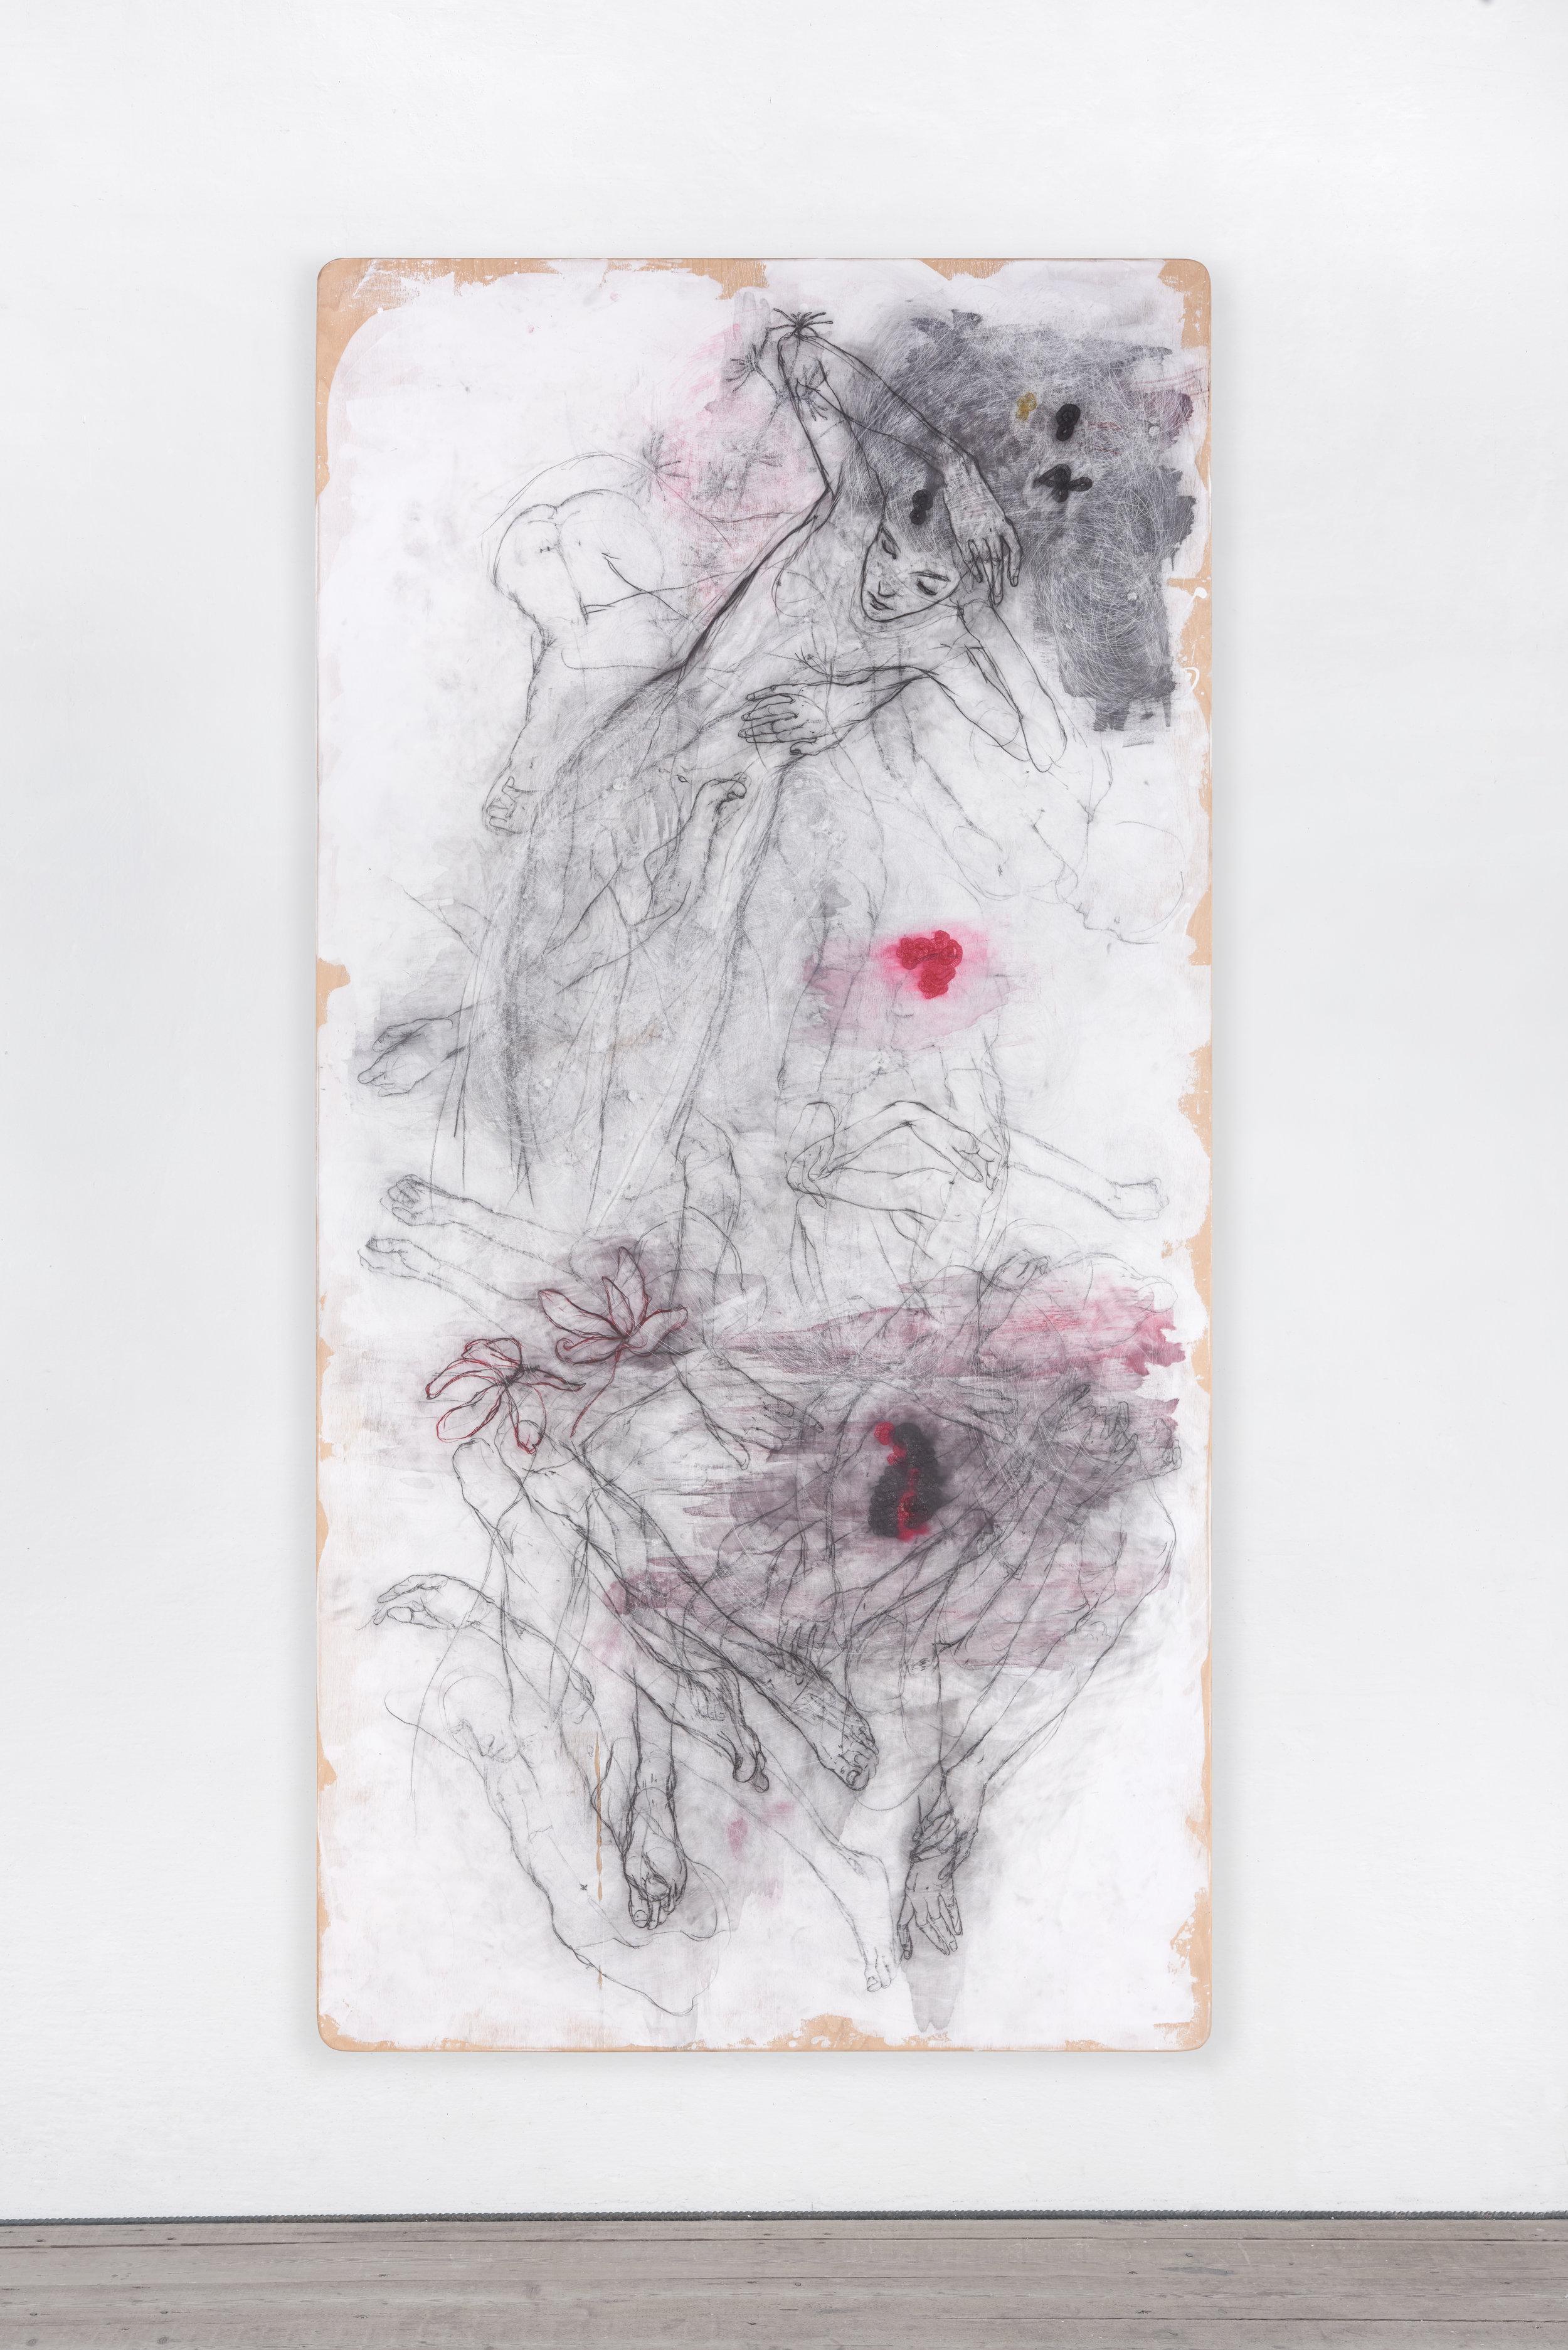 Peter Senoner, Botanicalirious VIII, 2017, graphite, pigment on beechwood, 250 x 125 x 4 cm